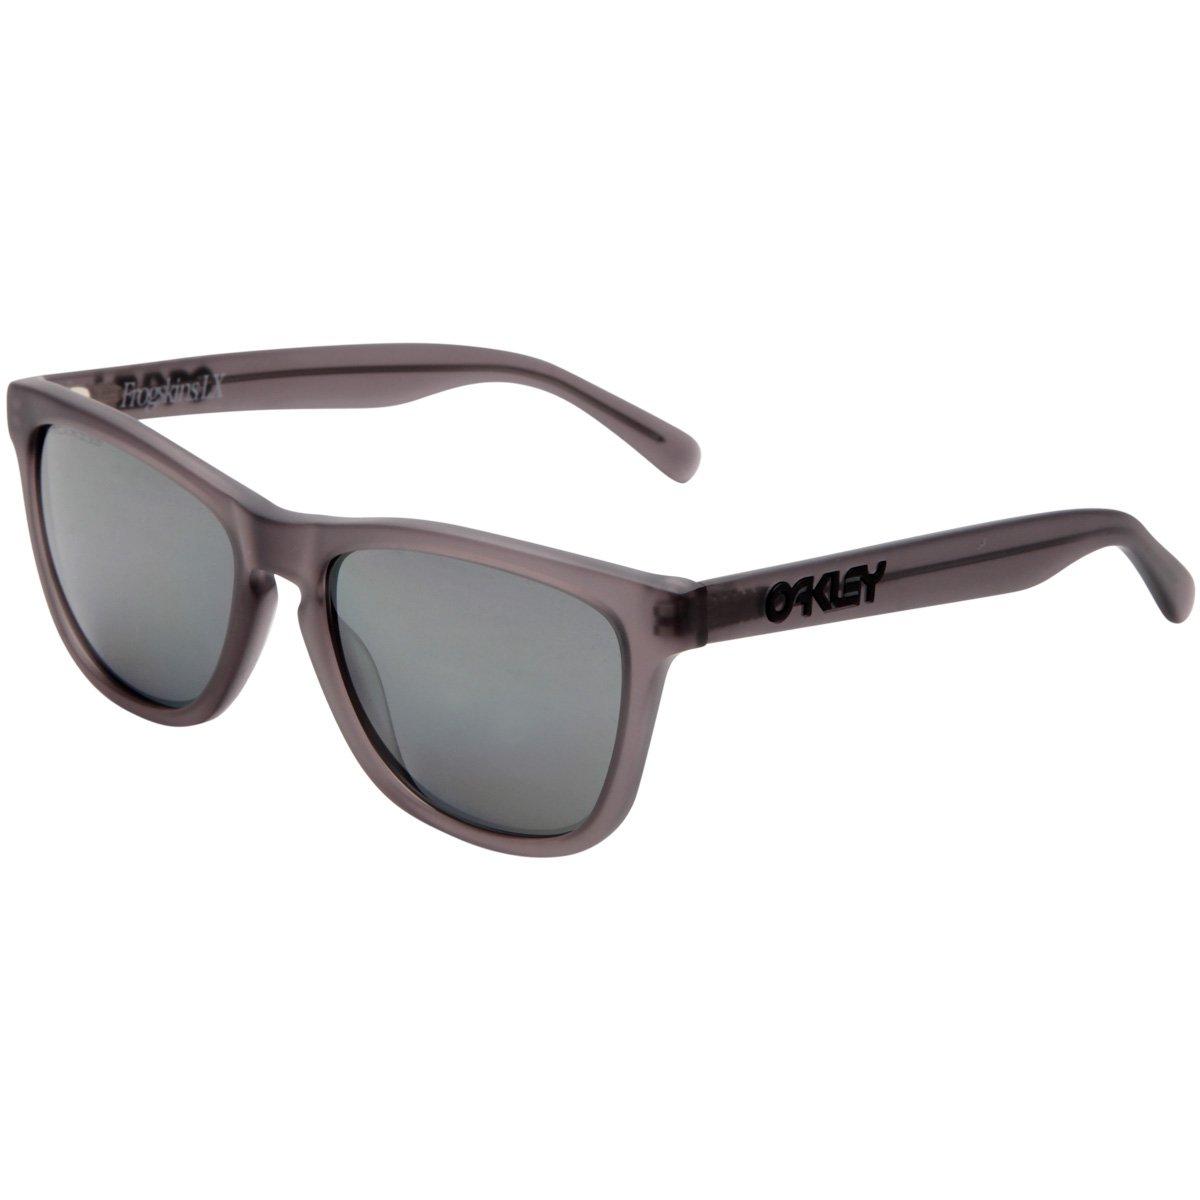 7bb82f0a256c9 óculos Oakley Deviation - Iridium Polarizado. Óculos de Sol Oakley Thinlink Iridium  Polarizado - Unissex